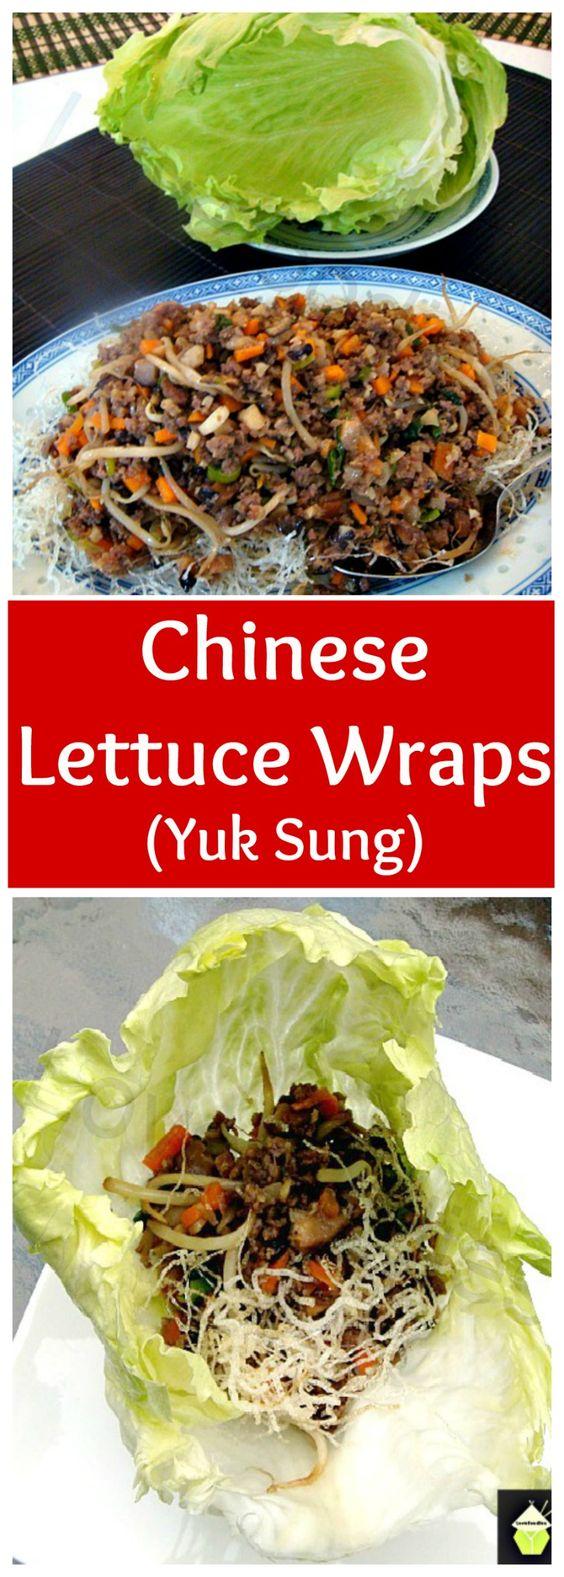 Yuk Sung - Chinese Lettuce Wraps - Inside each lettuce leaf is a little pile of…